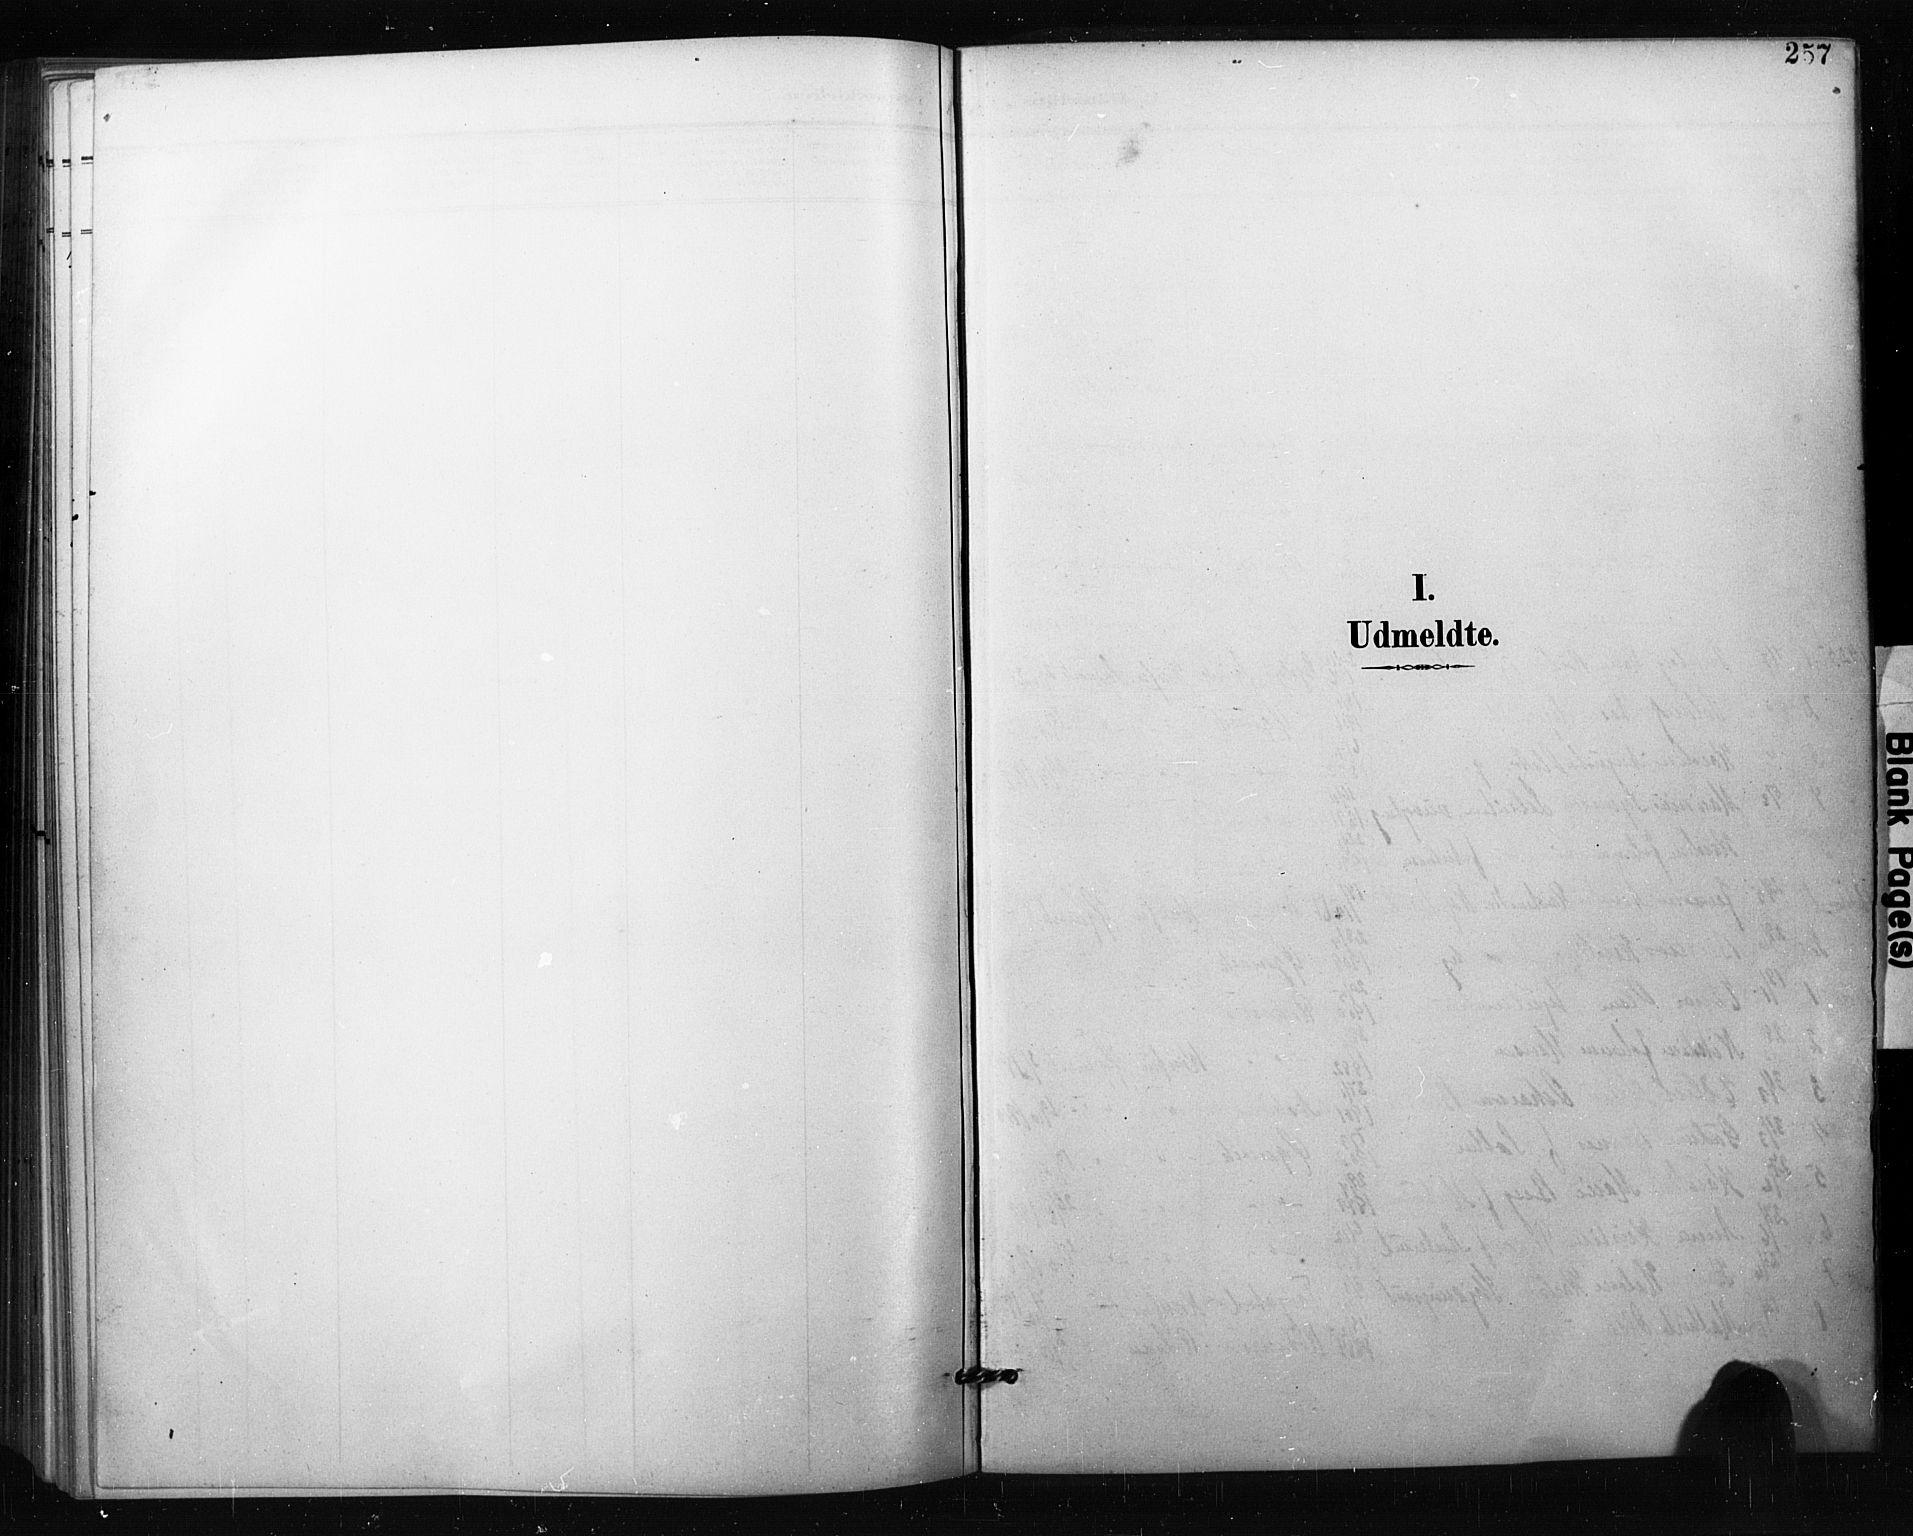 SAO, Aremark prestekontor Kirkebøker, G/Gb/L0001: Klokkerbok nr. II 1, 1901-1927, s. 257